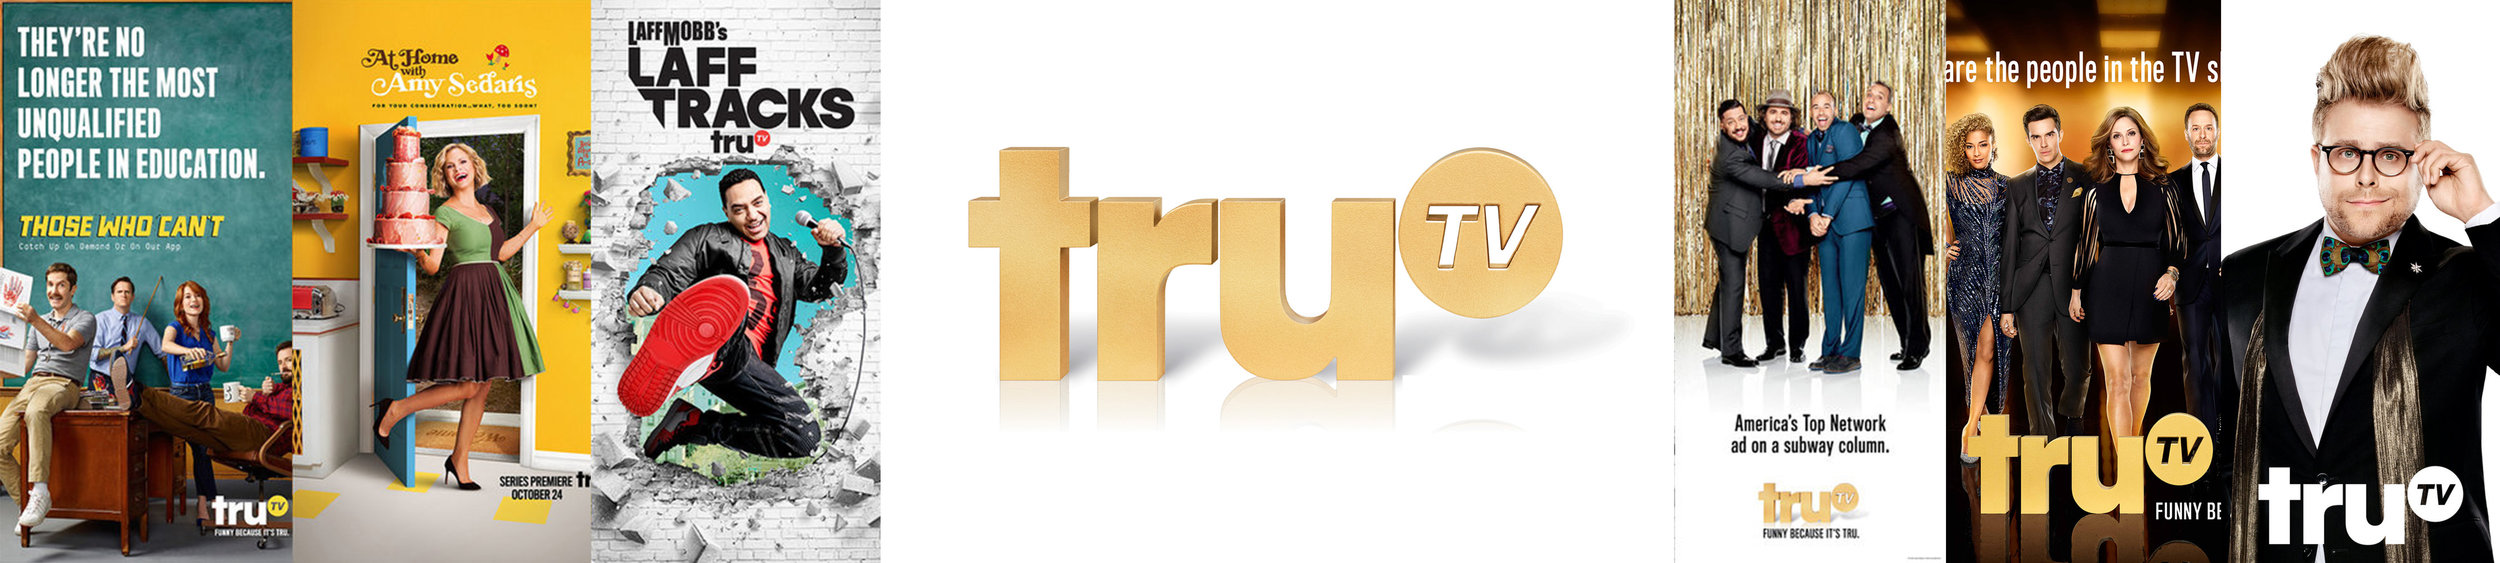 truTV PORTFOLIO